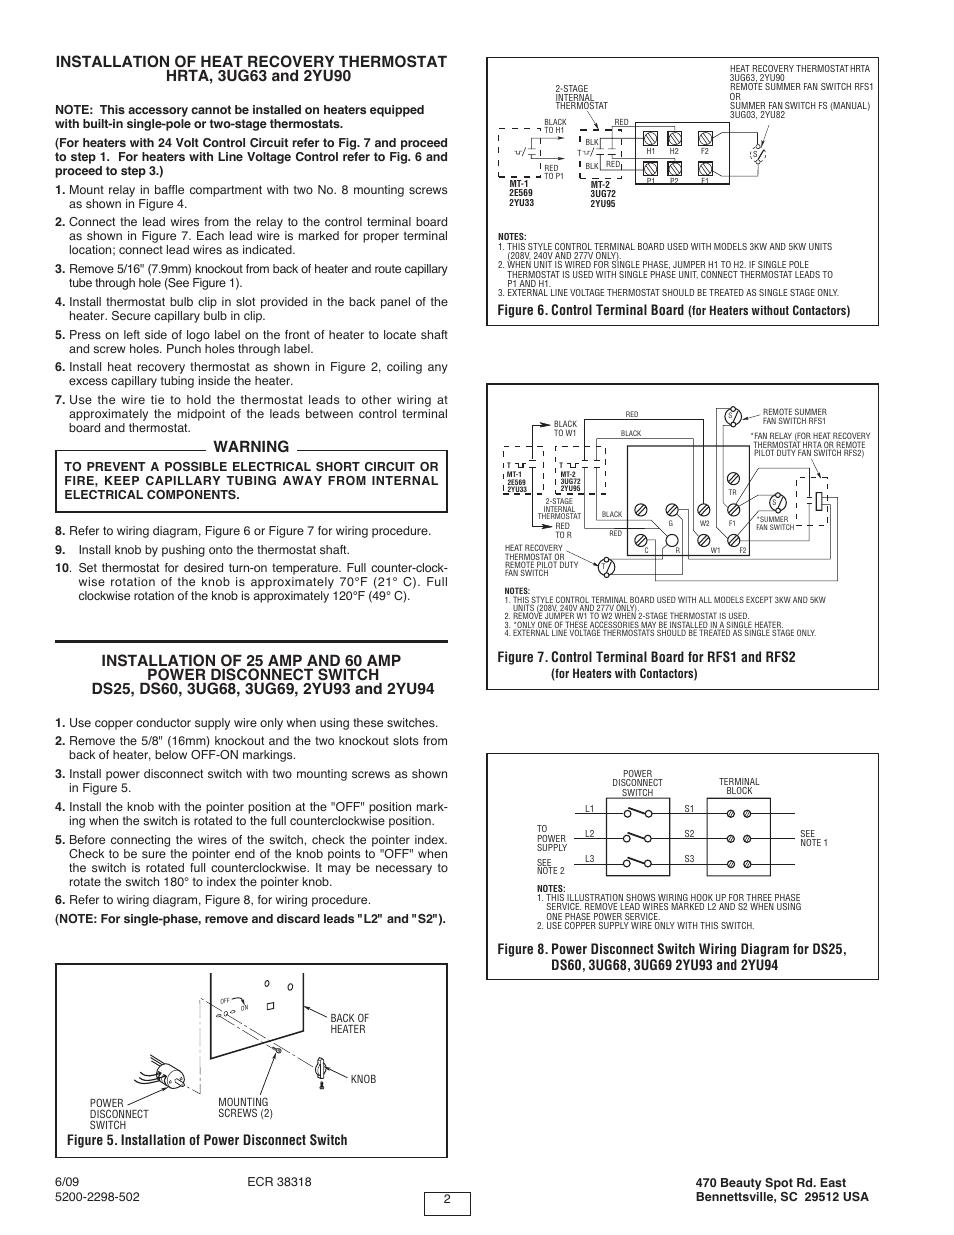 medium resolution of warning figure 6 control terminal board qmark muh horizontal downflow unit